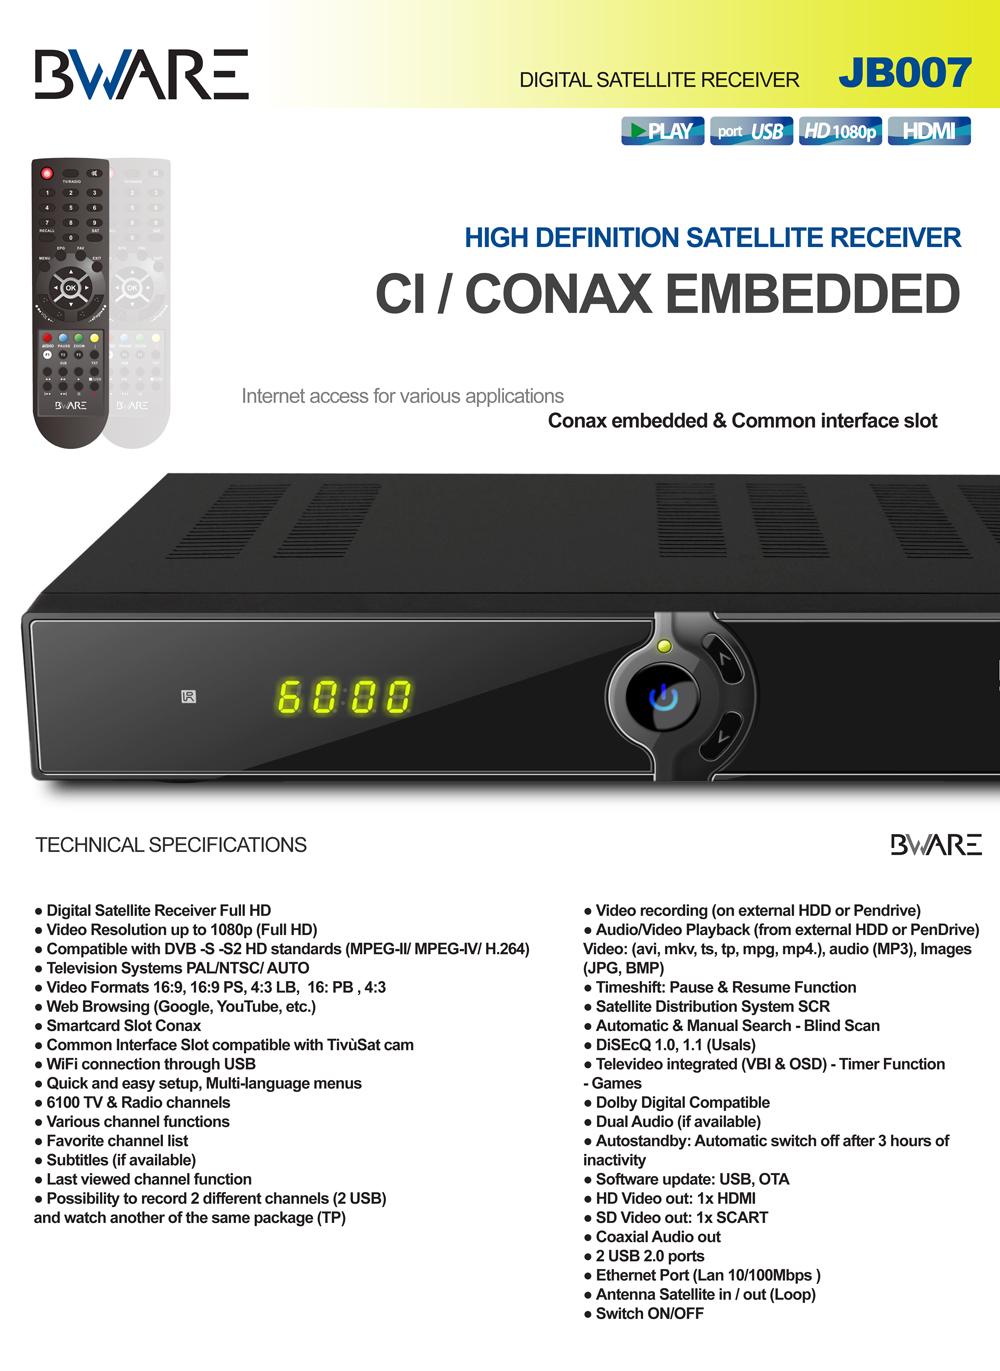 BWare JB007 DVB-S/ S2 HD CI Receiver LAN USB PVR Ready Full 1080p